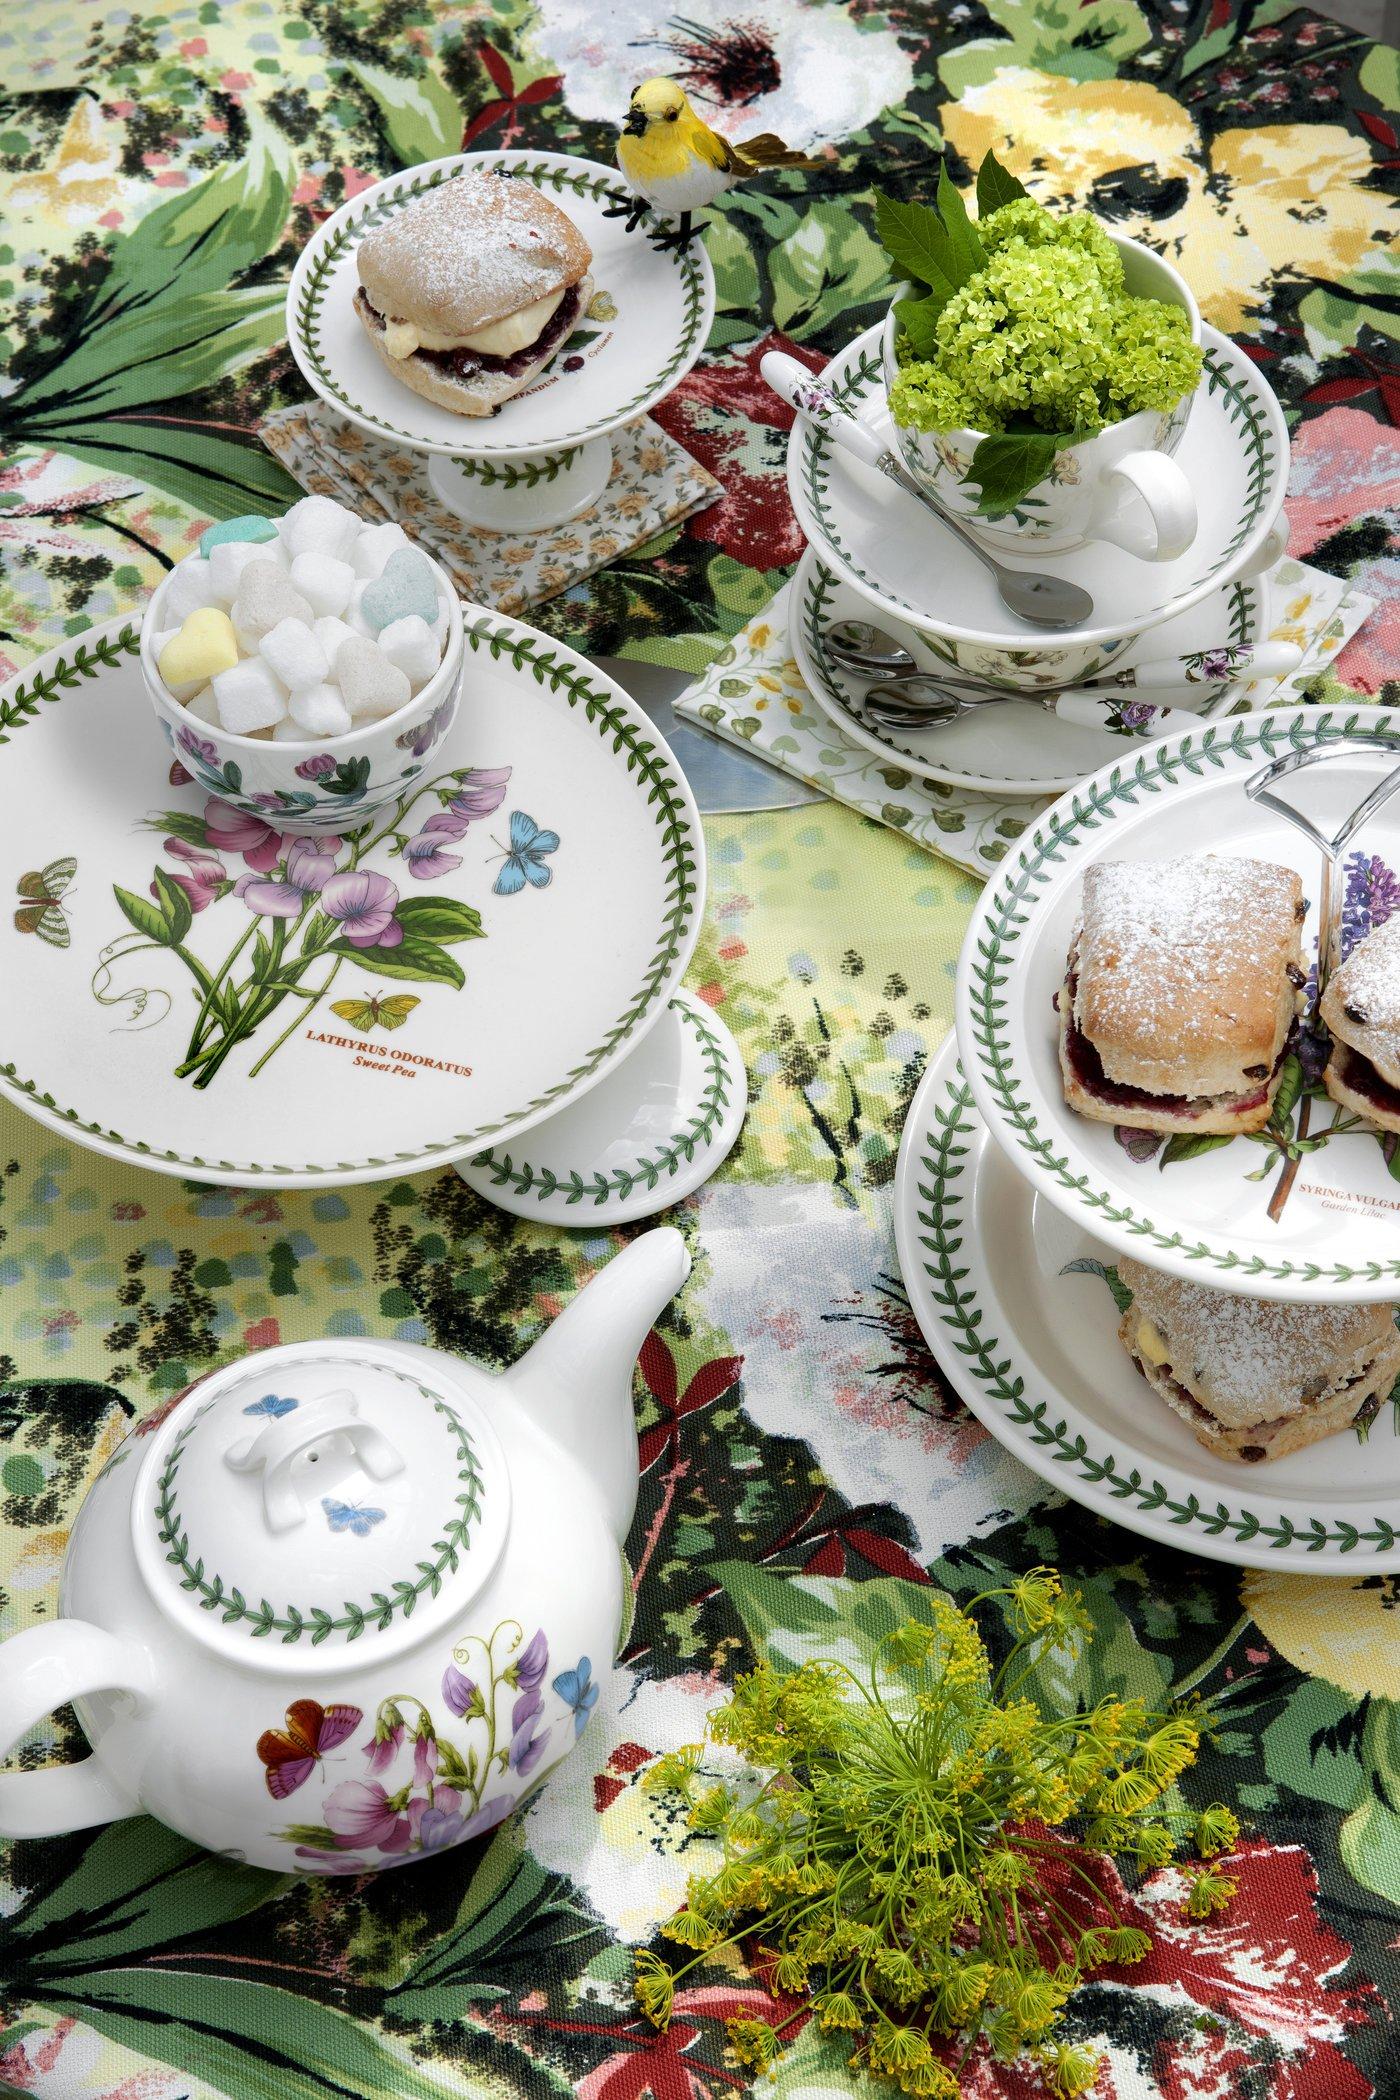 Portmeirion Botanic Garden Dinner Plates, Set of 6 Assorted Motifs by Portmeirion (Image #4)